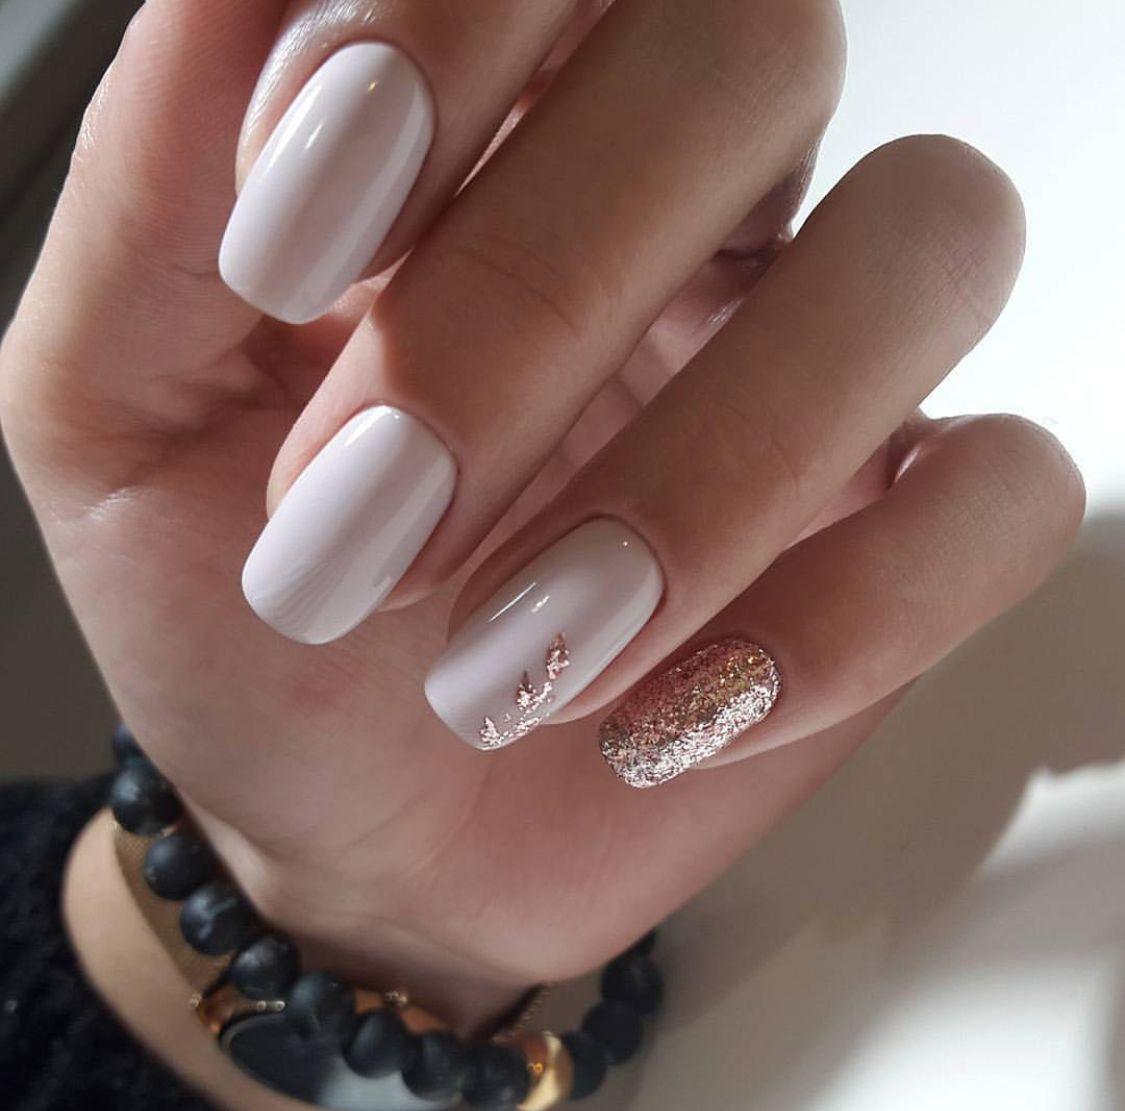 Gold design on nail is so cute. #gelnails #glitternails